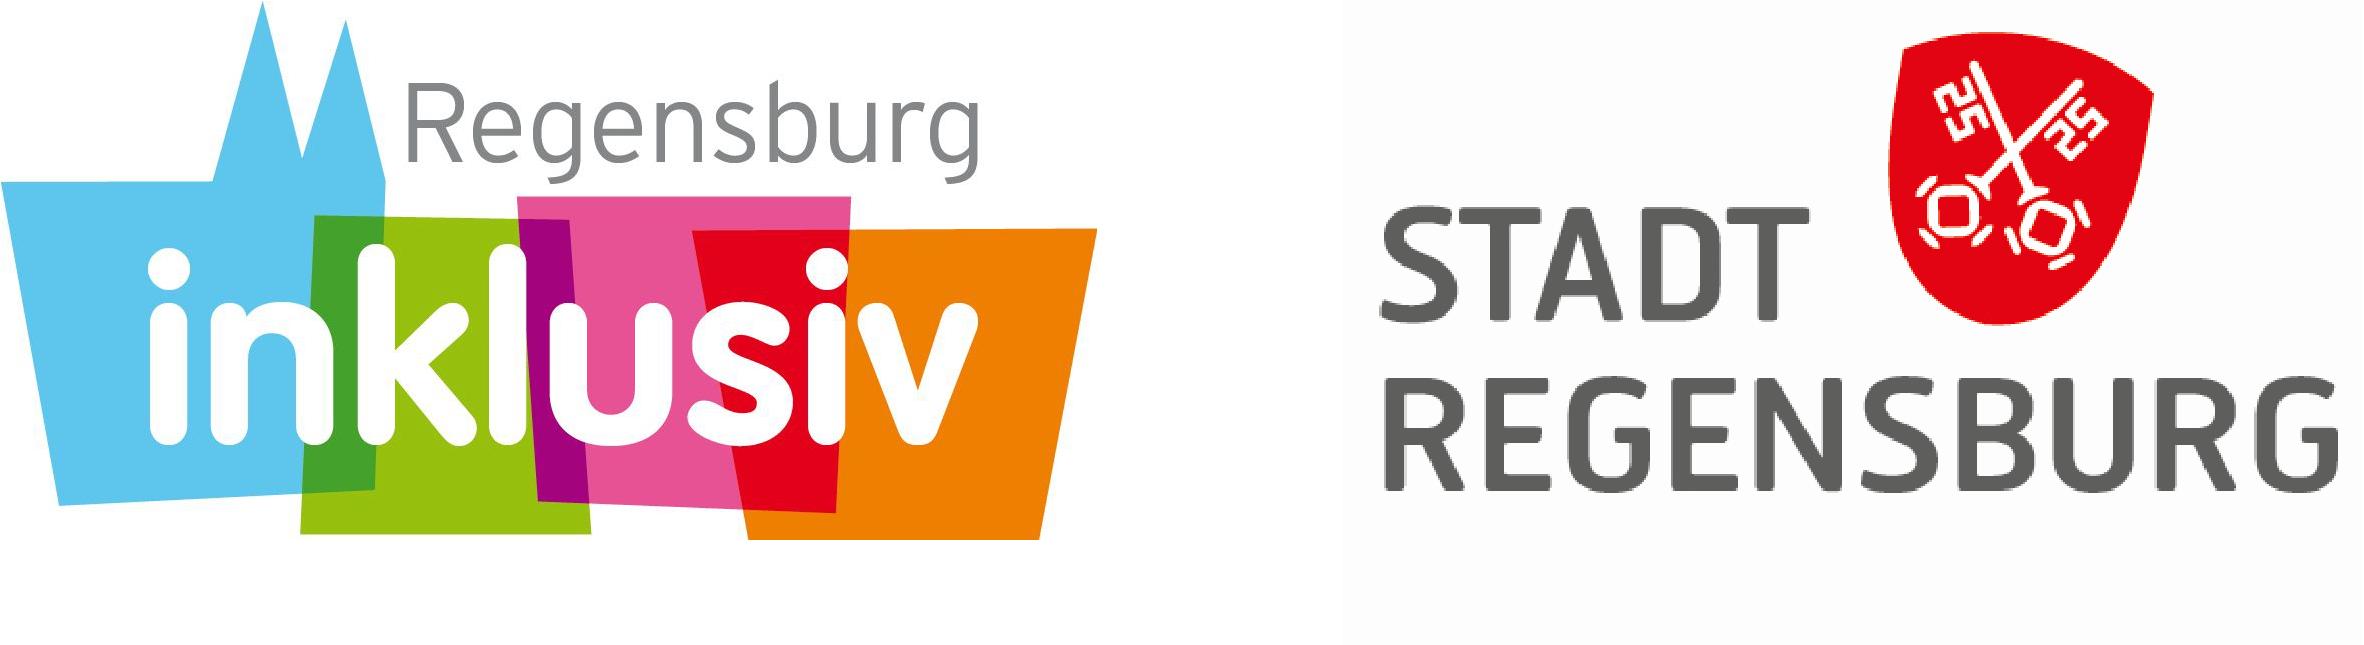 Logo Regensburg inklusiv Stadt Regensburg.png